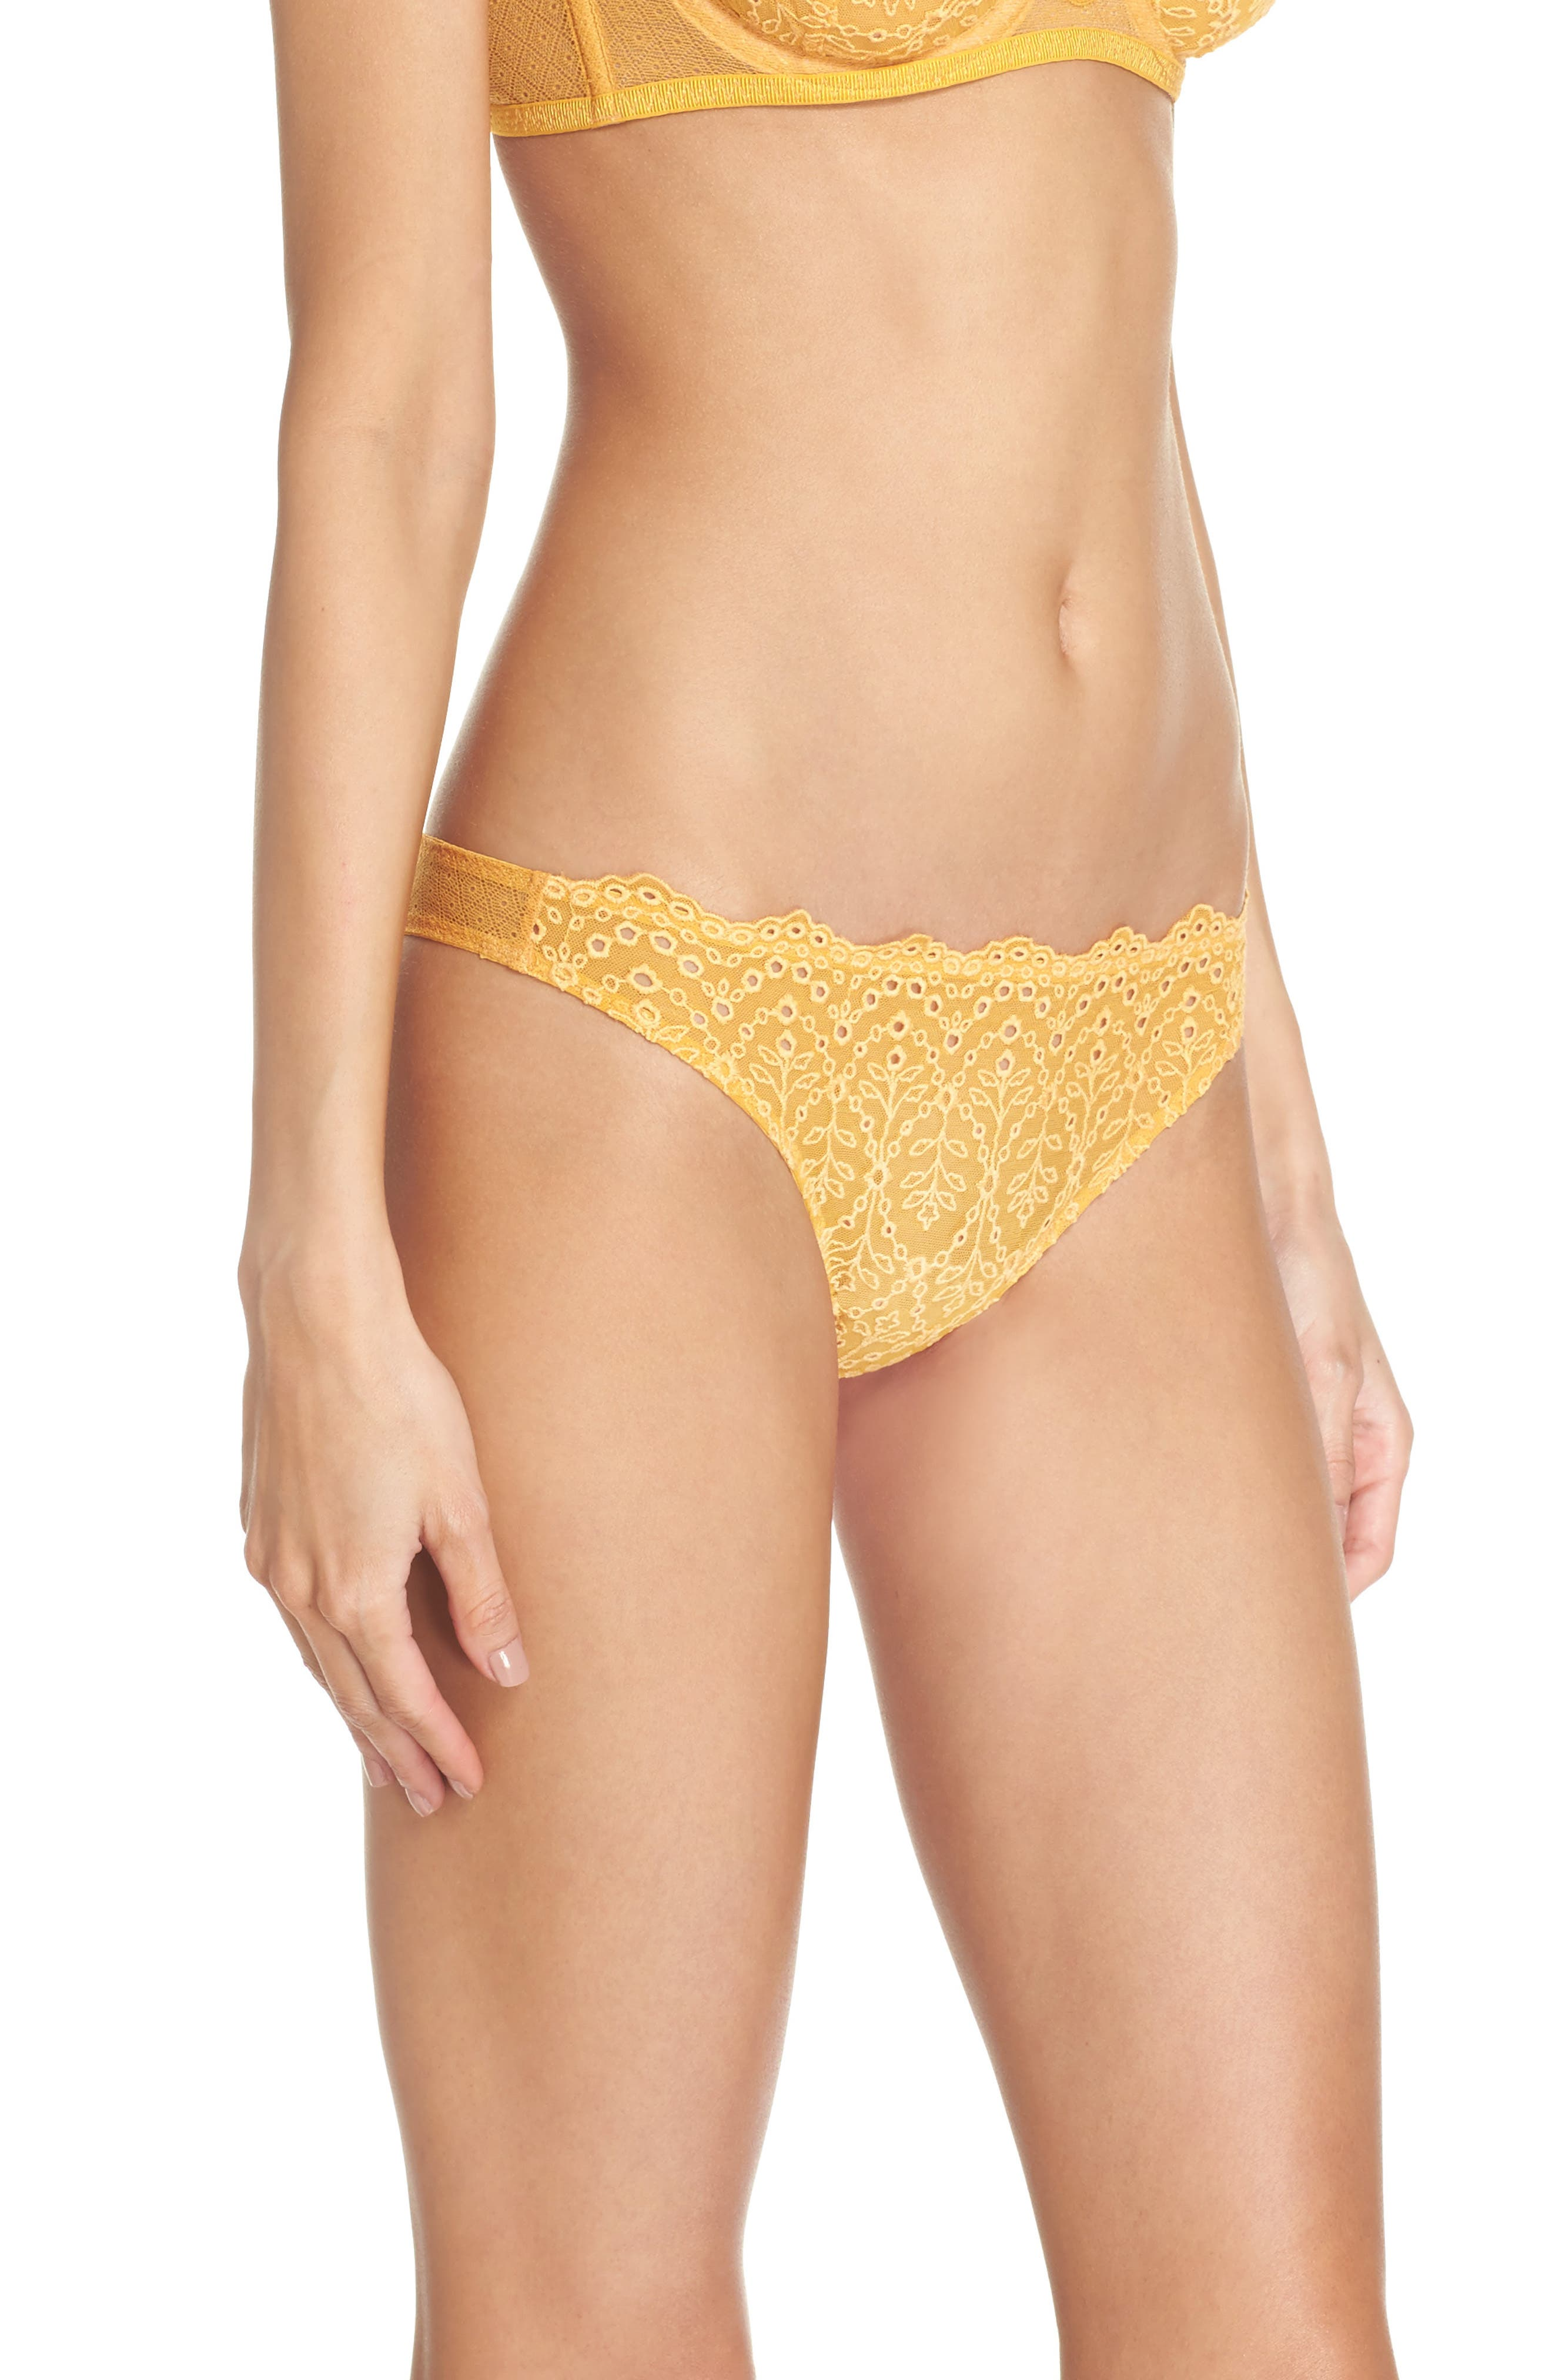 Intimately FP St. Tropez Tanga Panties,                             Alternate thumbnail 3, color,                             Yellow